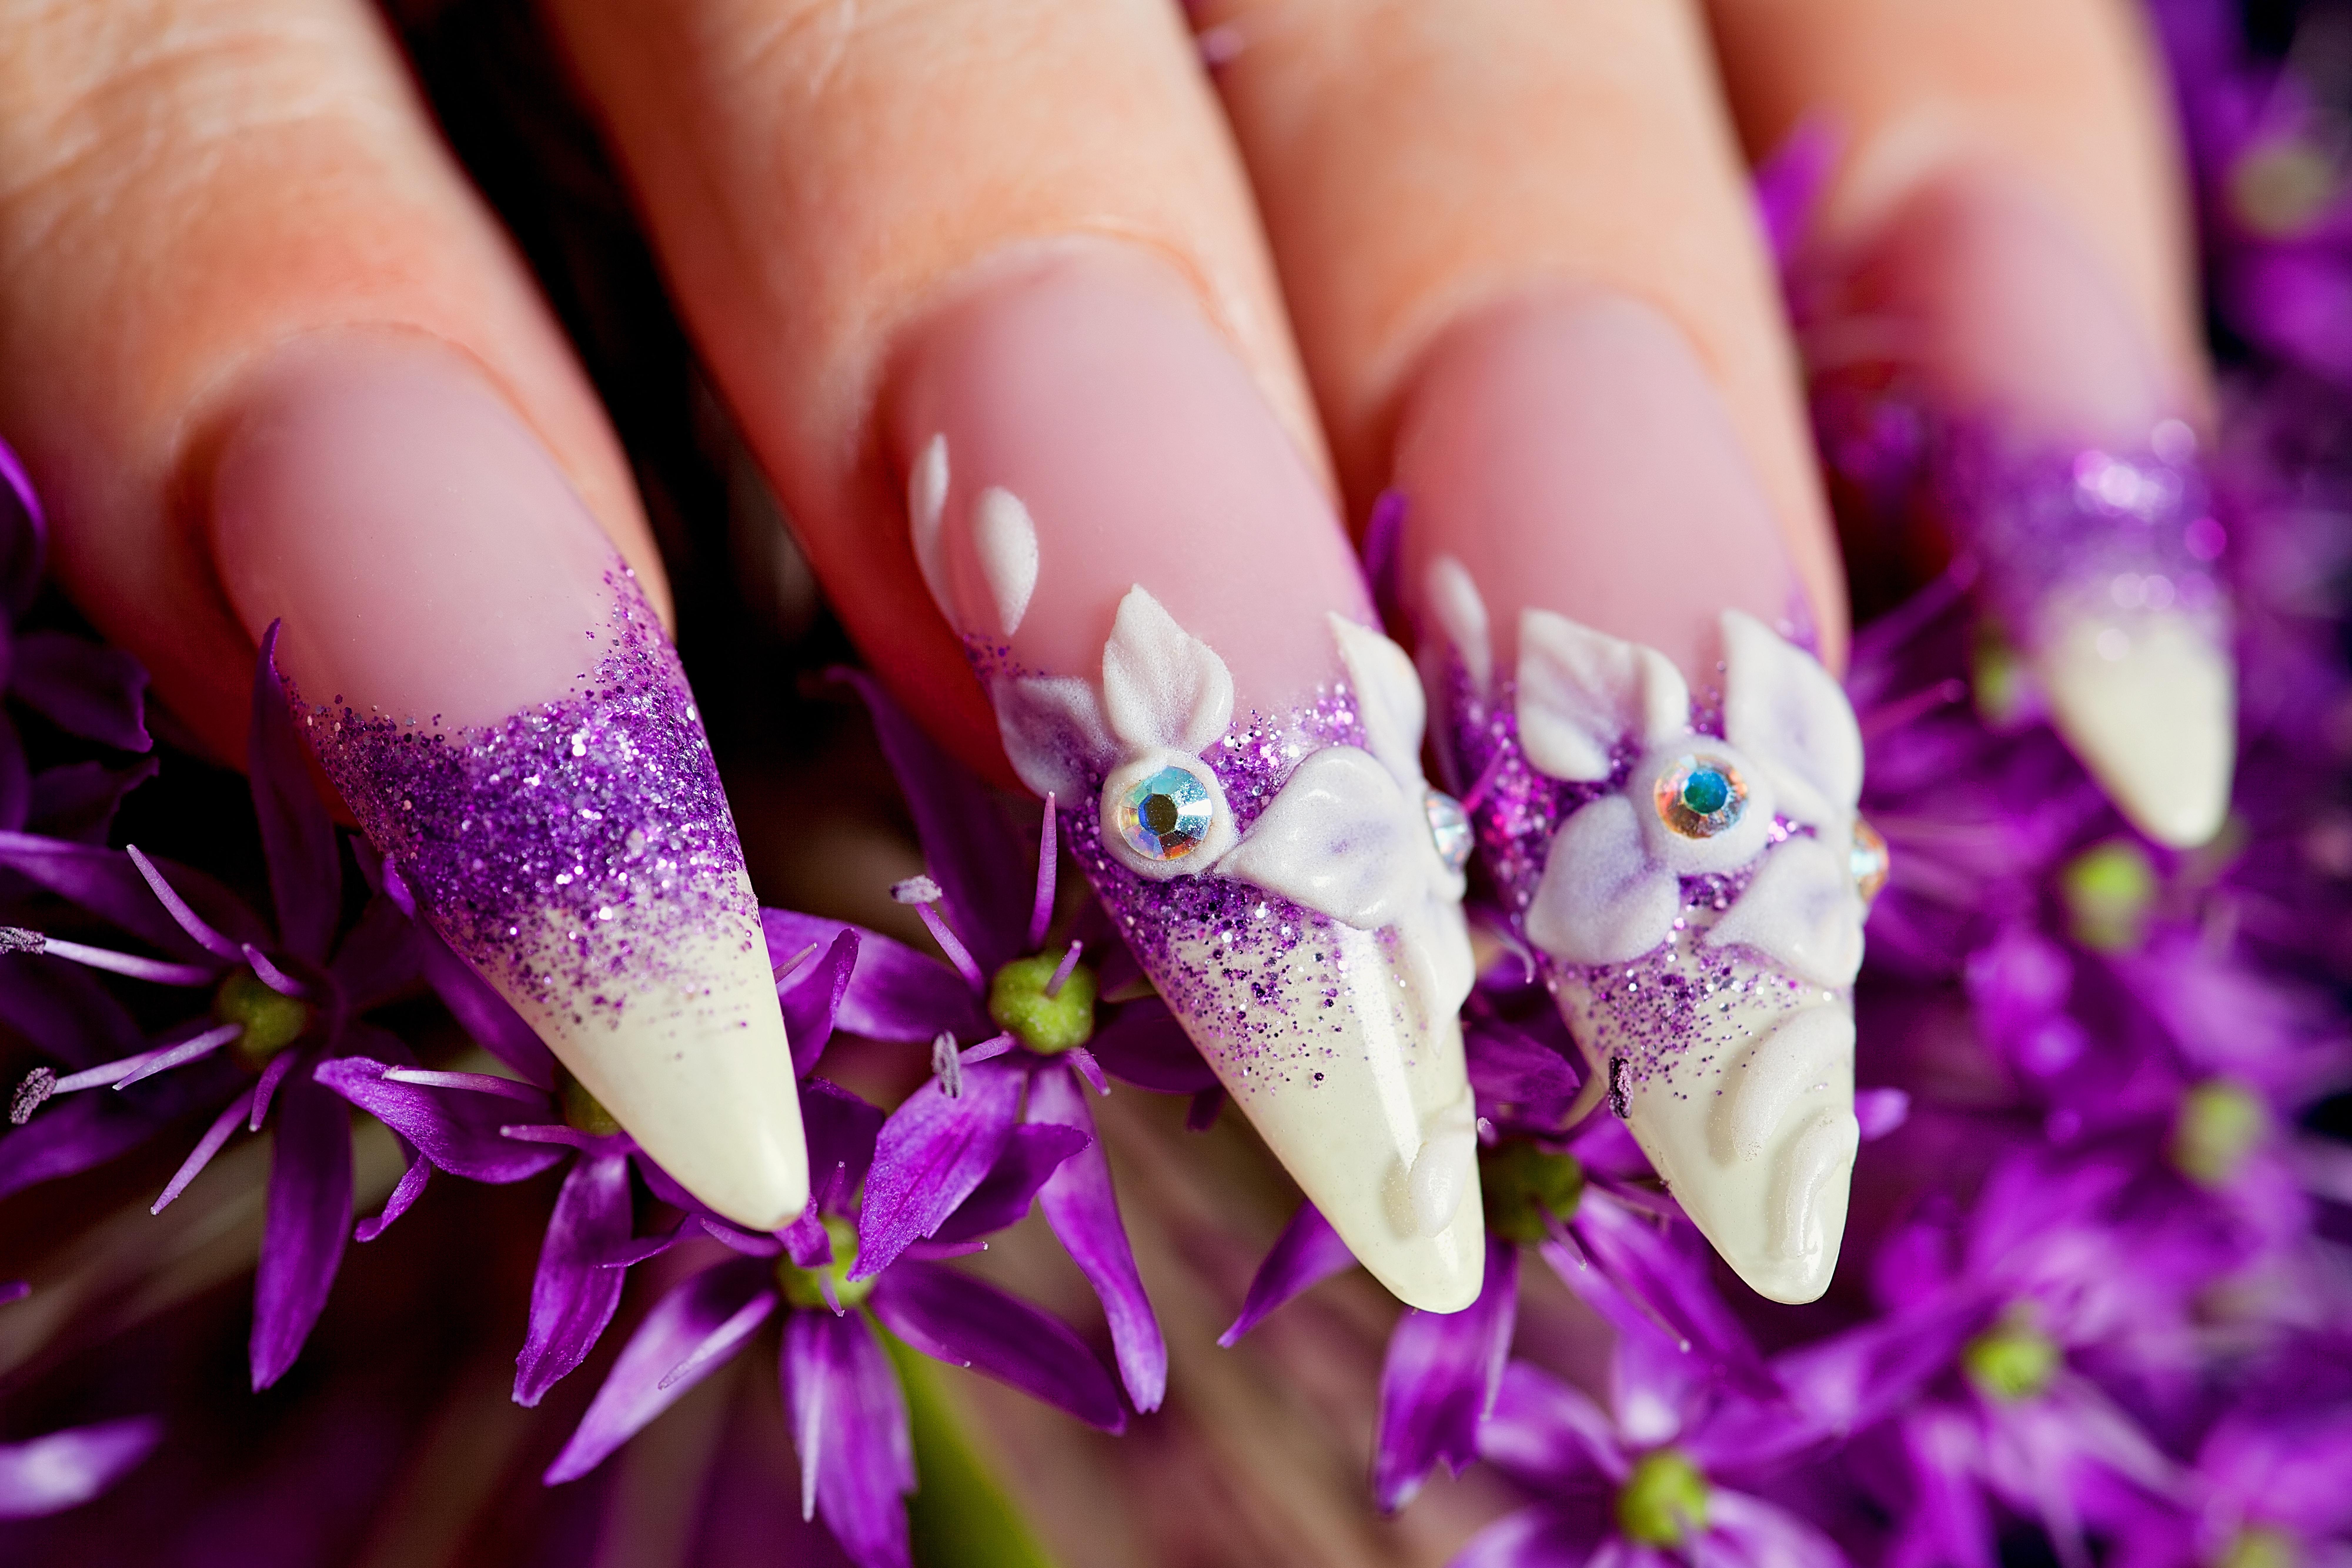 Картинки с тематикой наращивание ногтей